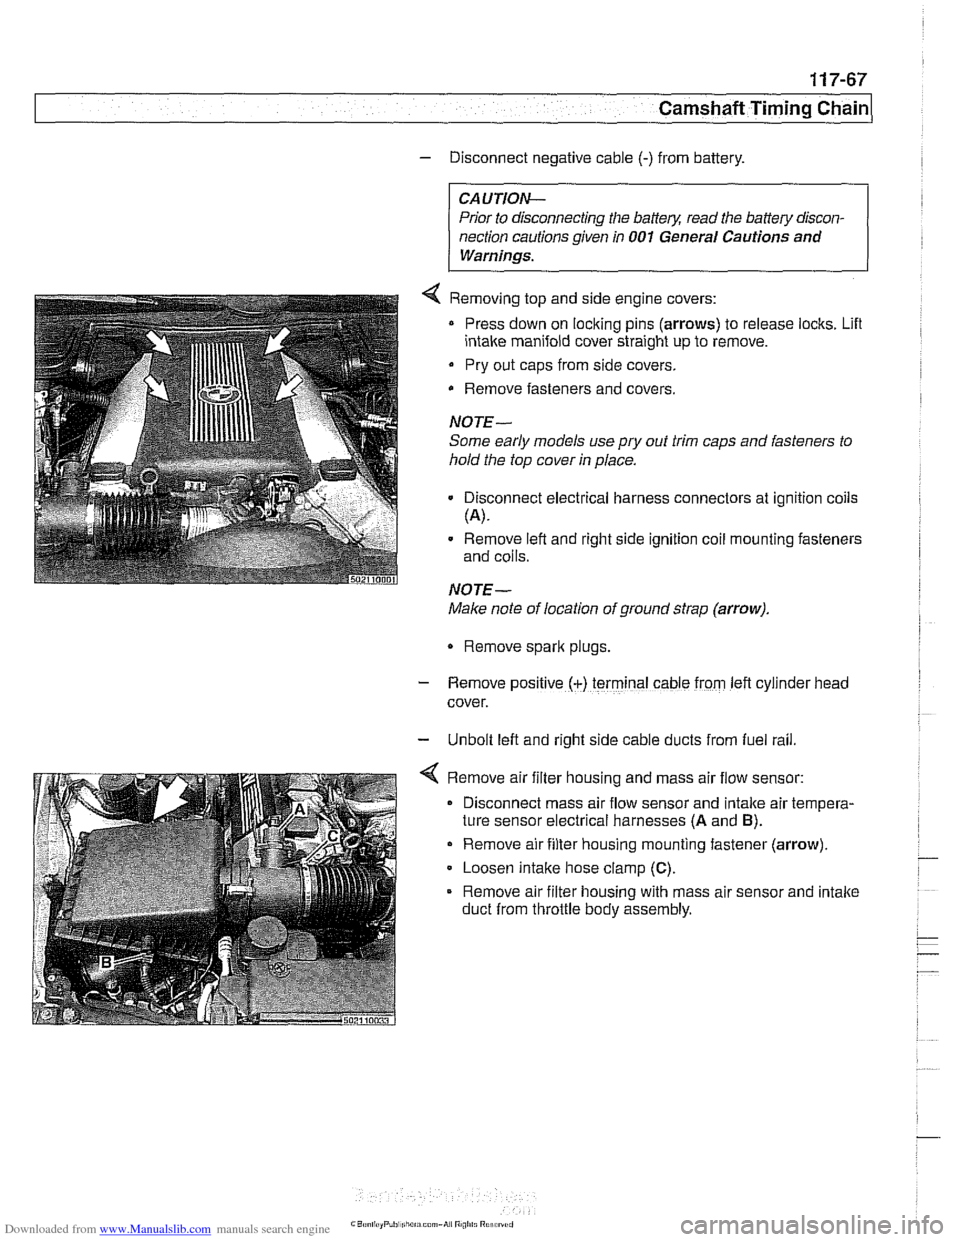 Battery Bmw 530i 2001 E39 Workshop Manual Engine Module Wiring Diagram Page 303